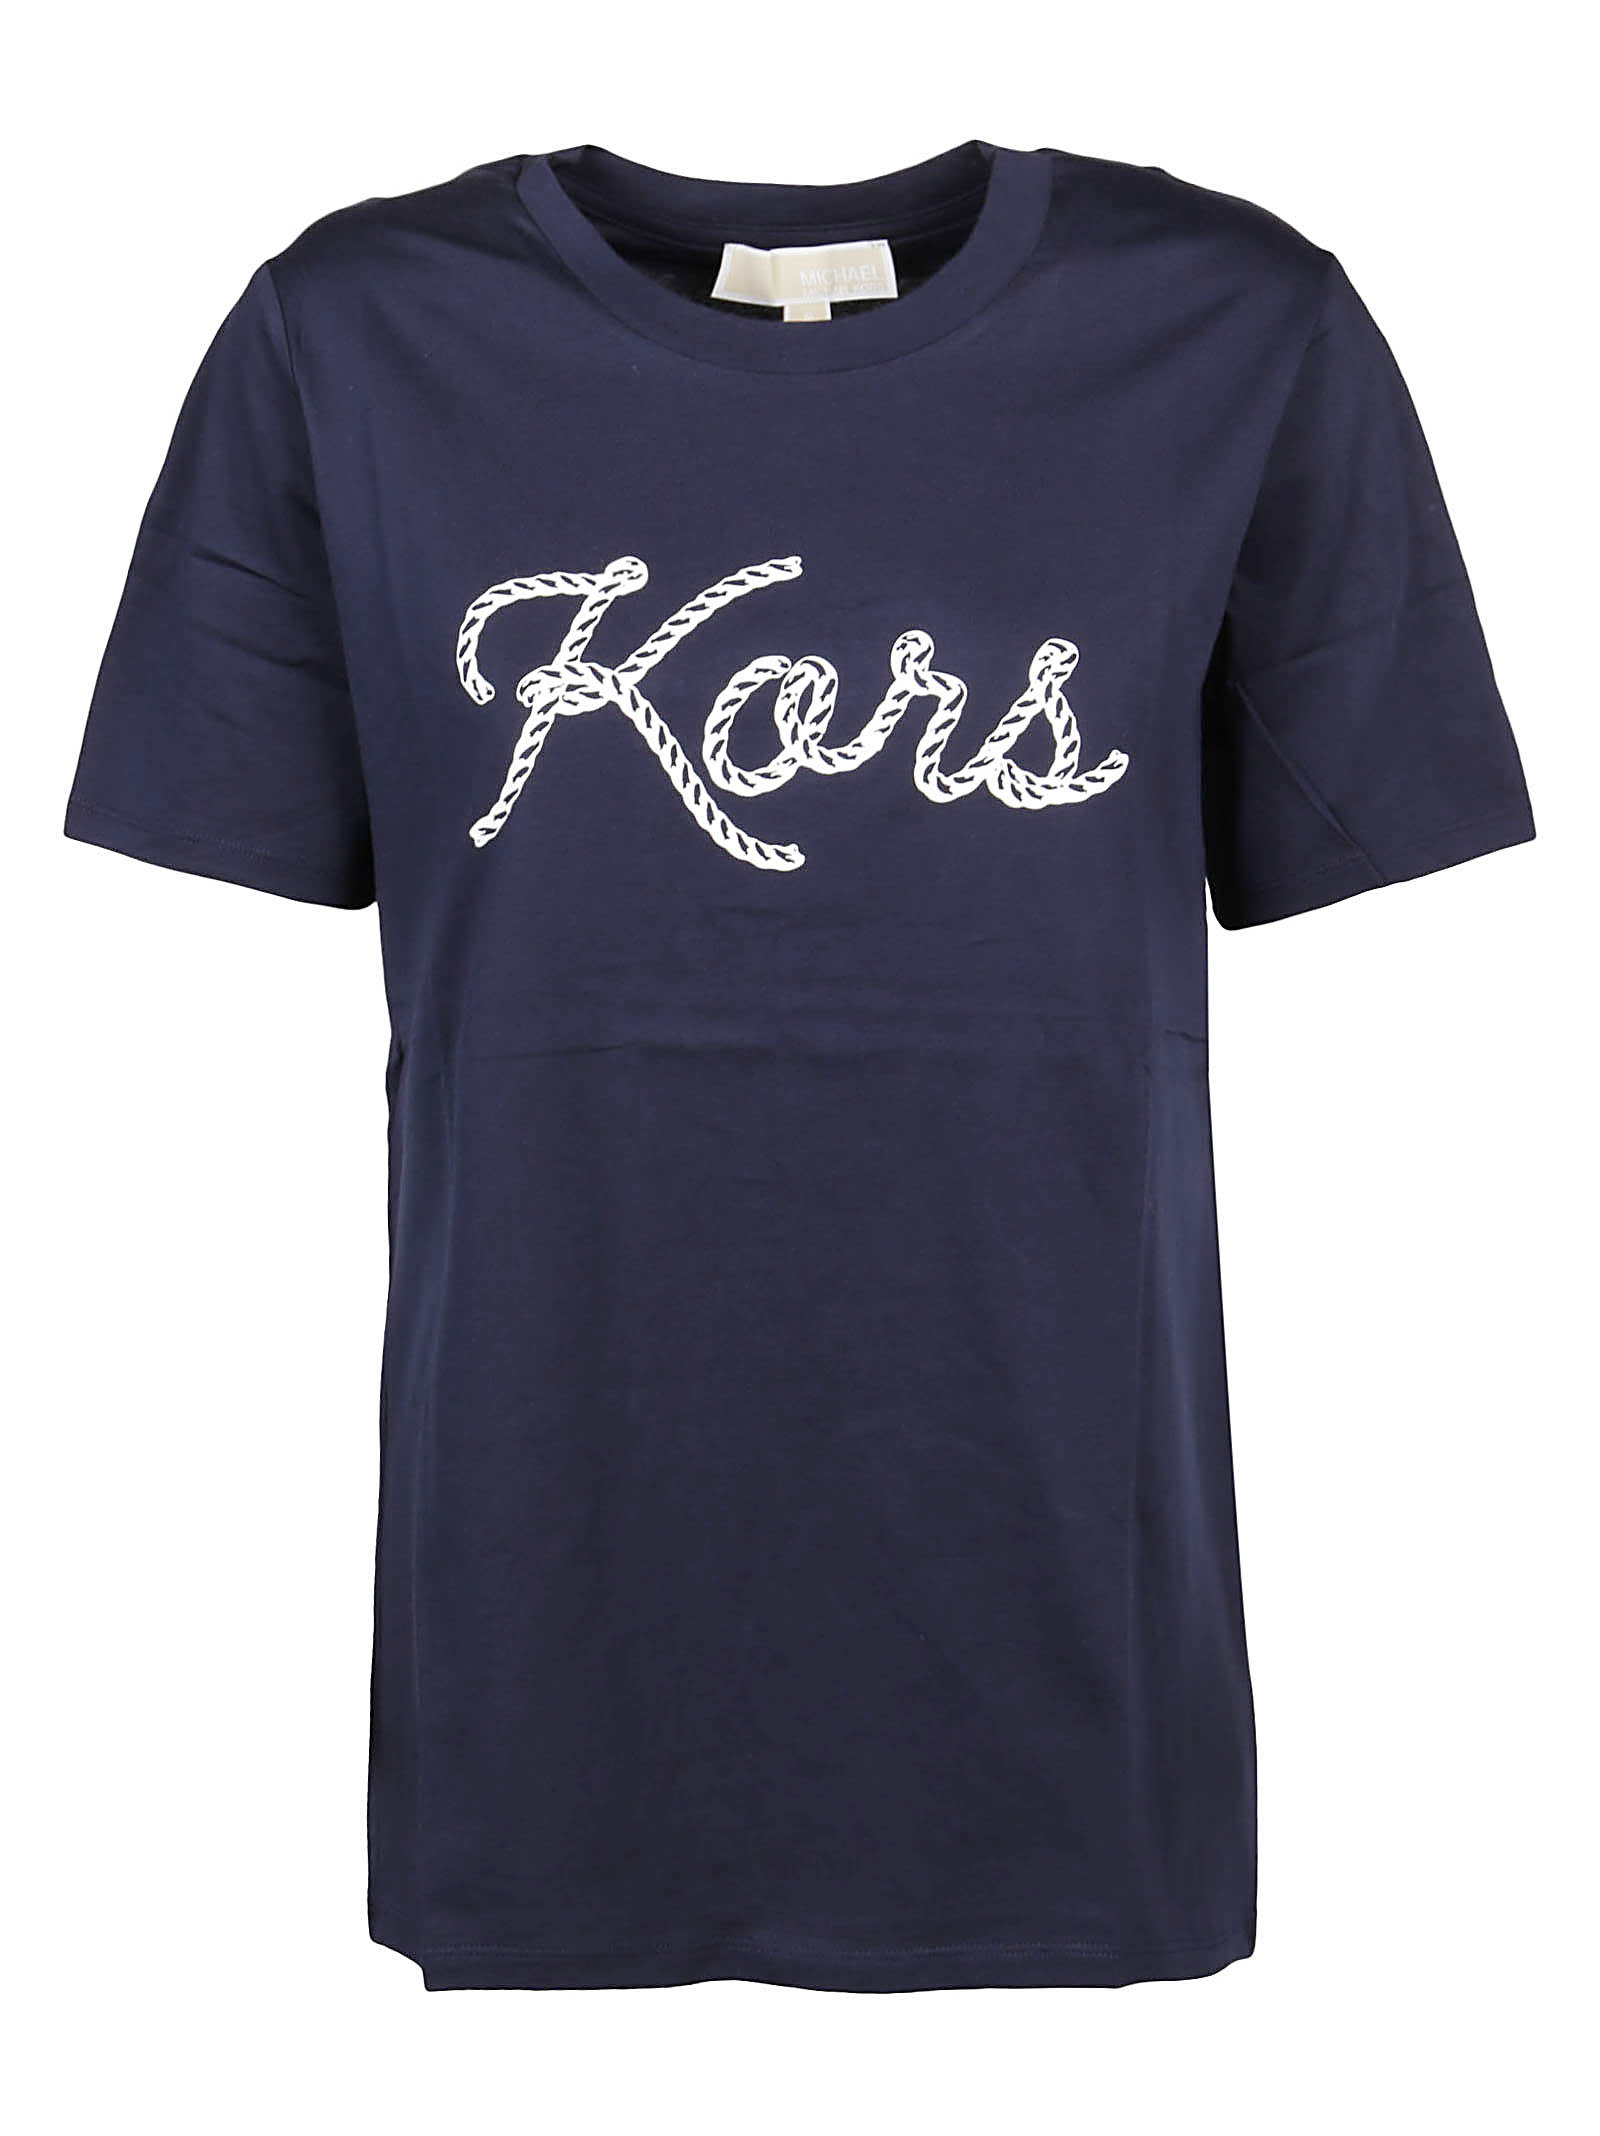 Michael Kors T-shirts KORS ROPE GRAPHIC T-SHIRT